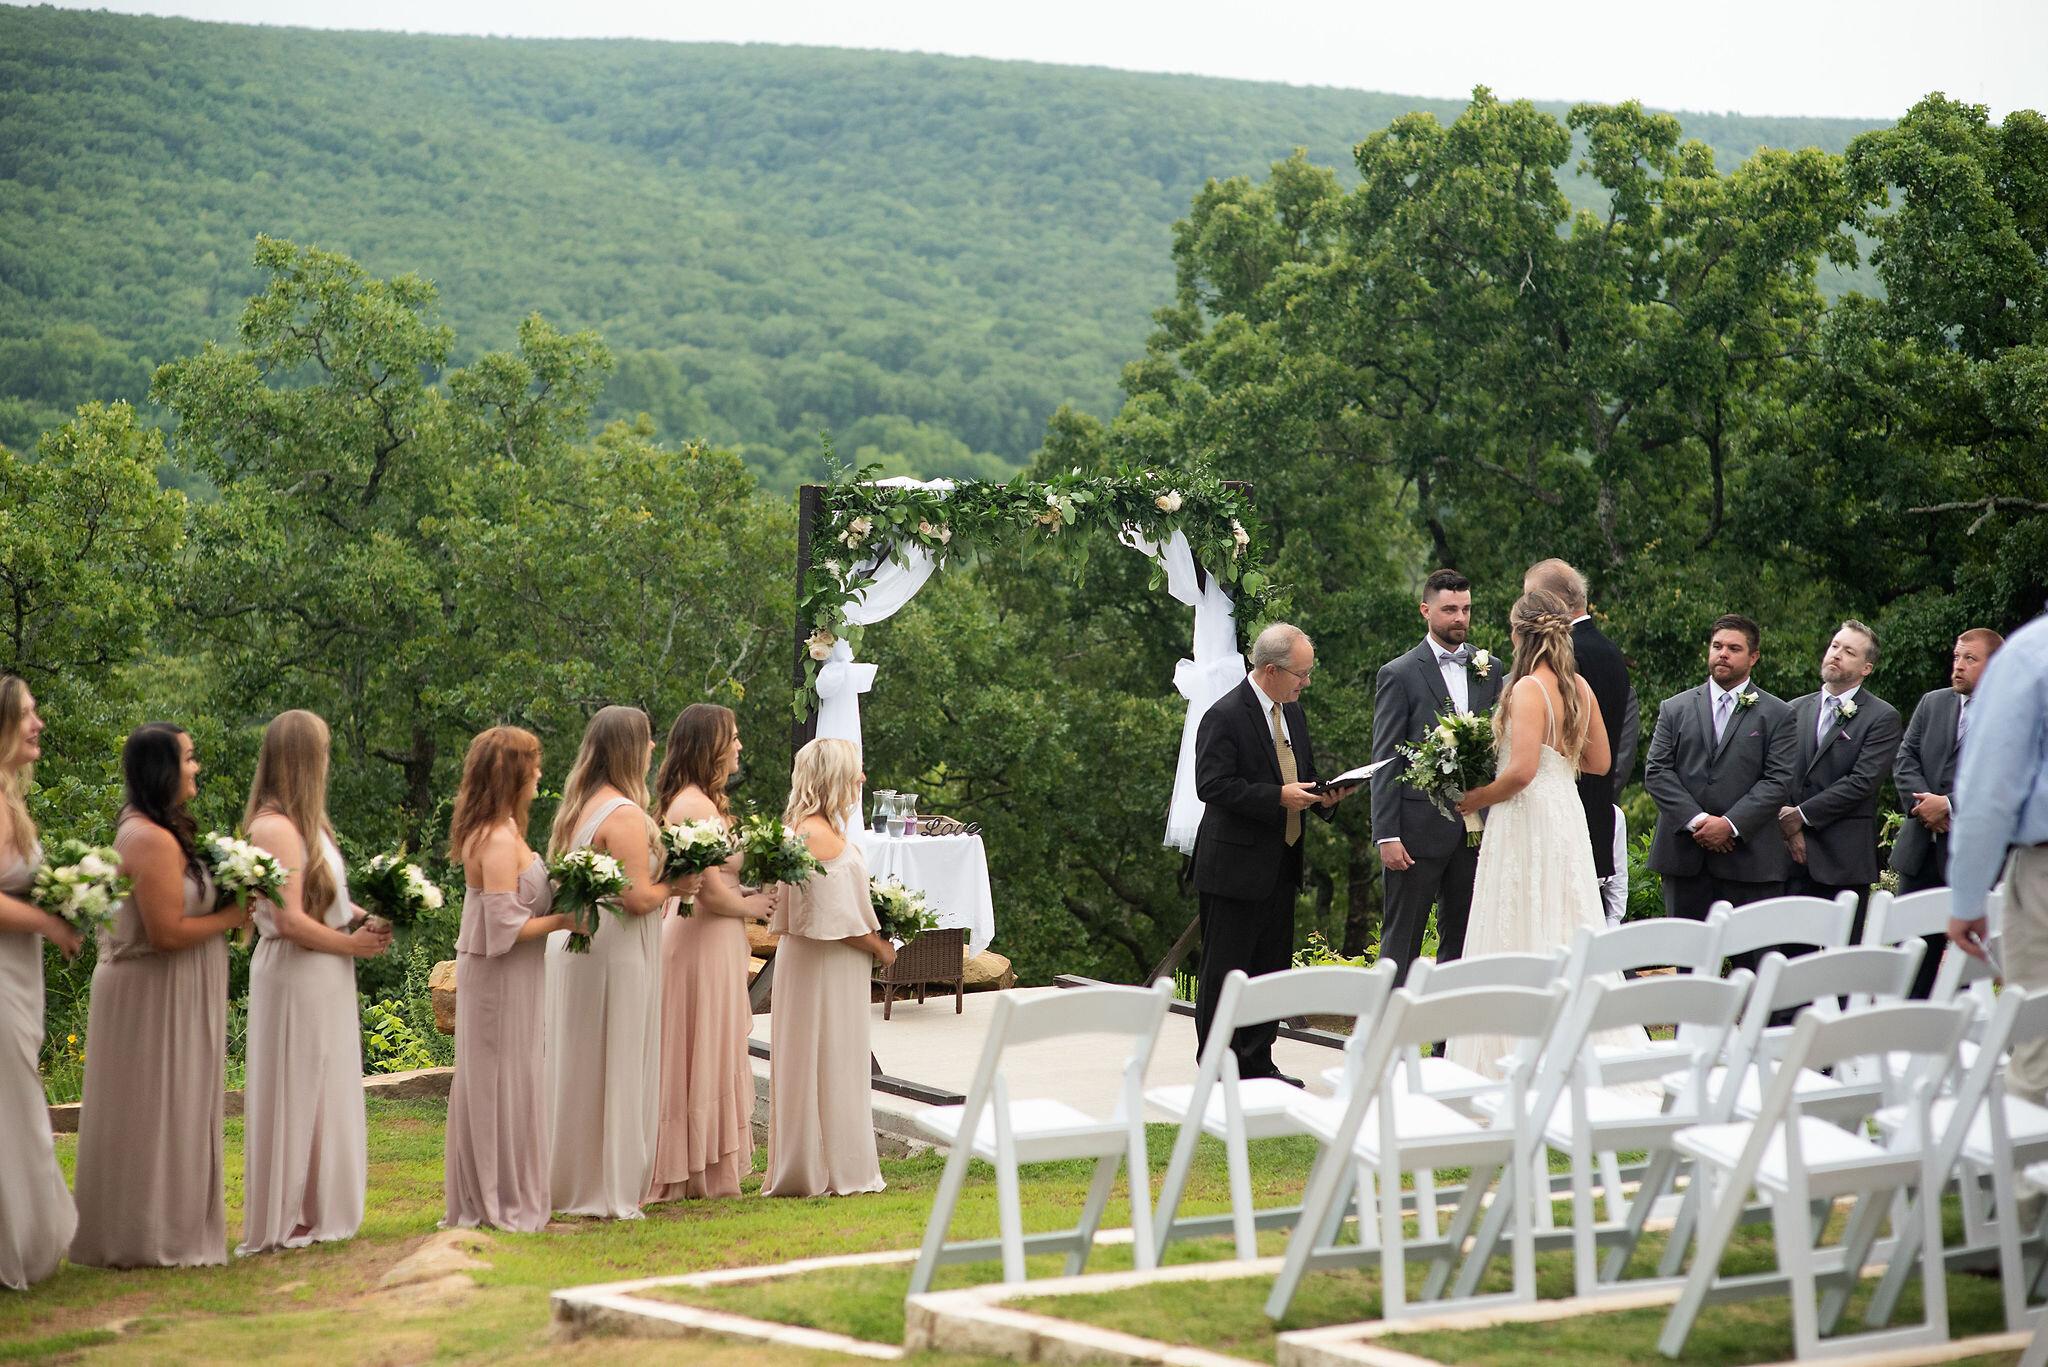 Oklahoma Summer Wedding Venue Dream Point Ranch 28.jpg